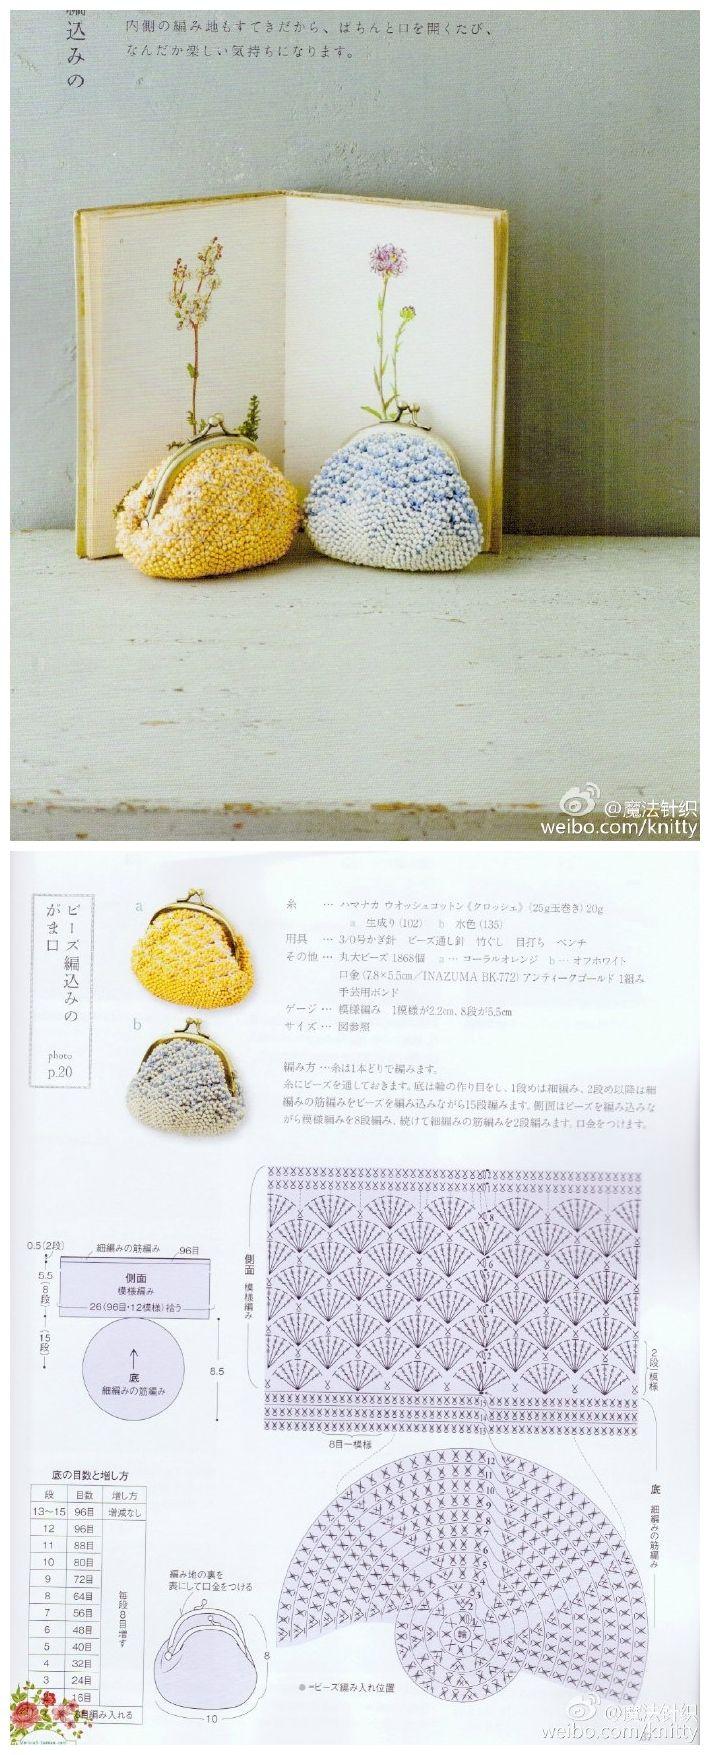 Pin de Piengjit Hru en Crochet Bag | Pinterest | Monederos, Bolsos y ...